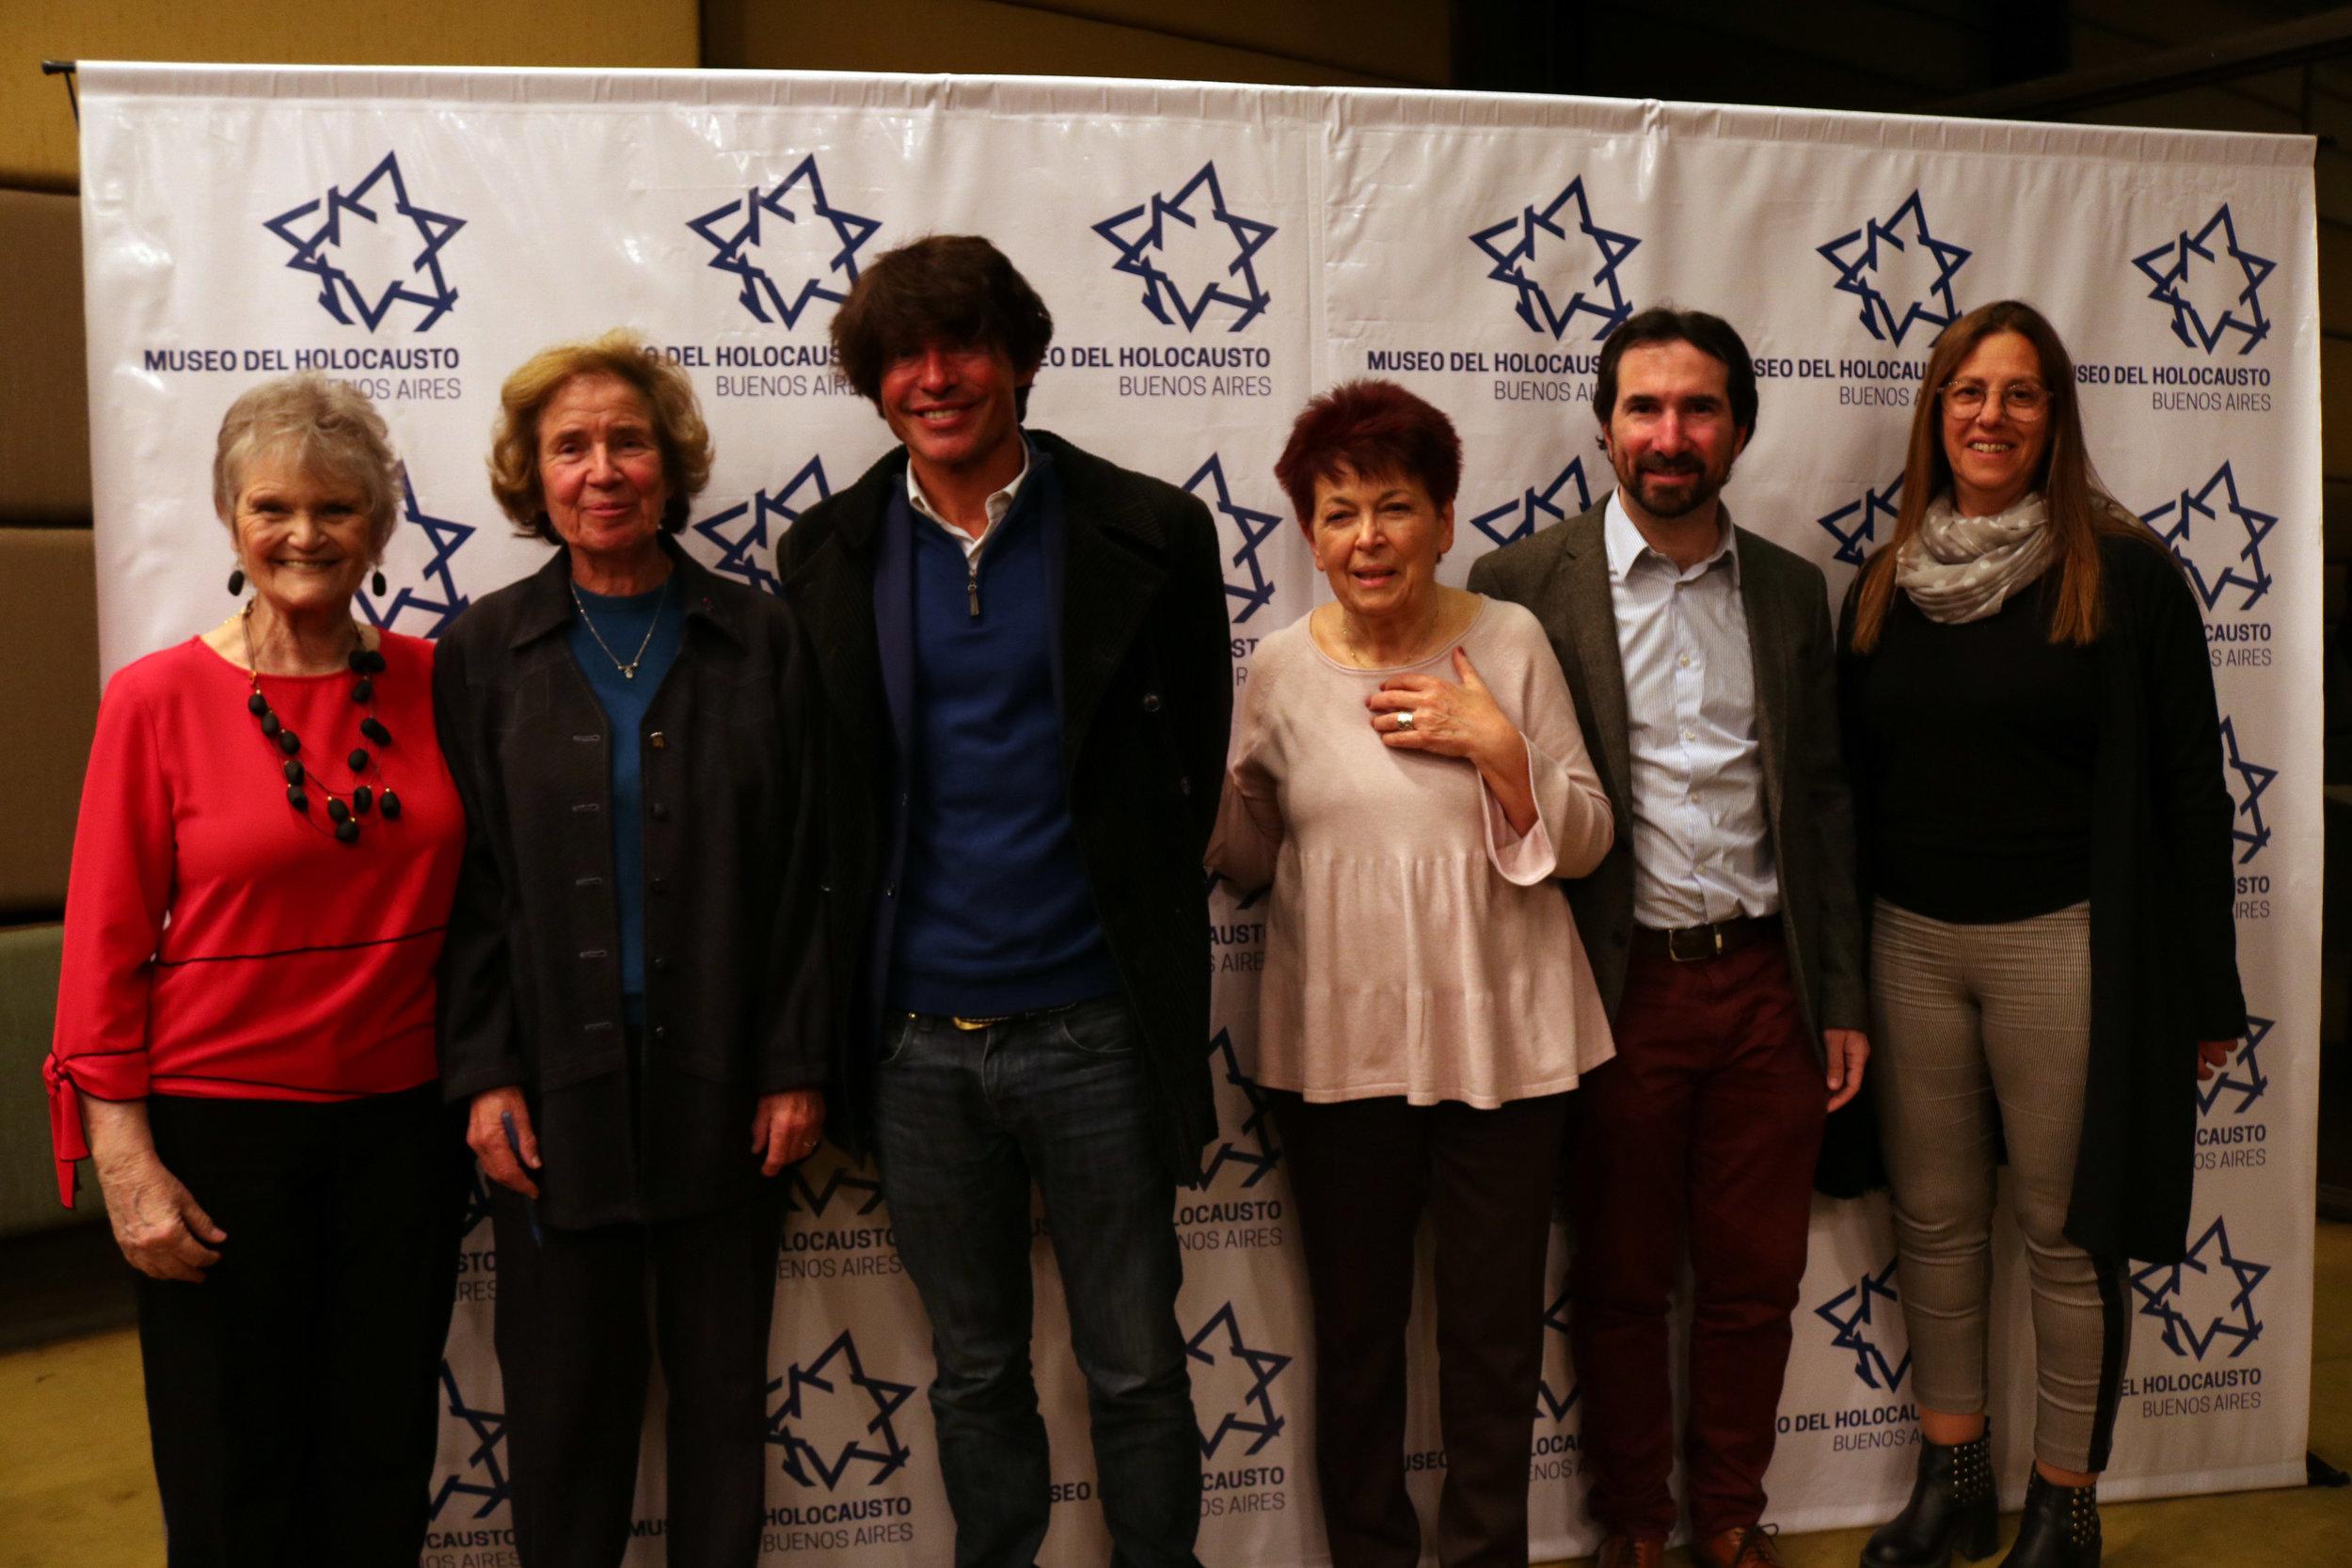 Con Beate y Arno Klarsfeld, Hélène Gutkowski, Jonathan Karszenbaum y Fabiana Mindlin